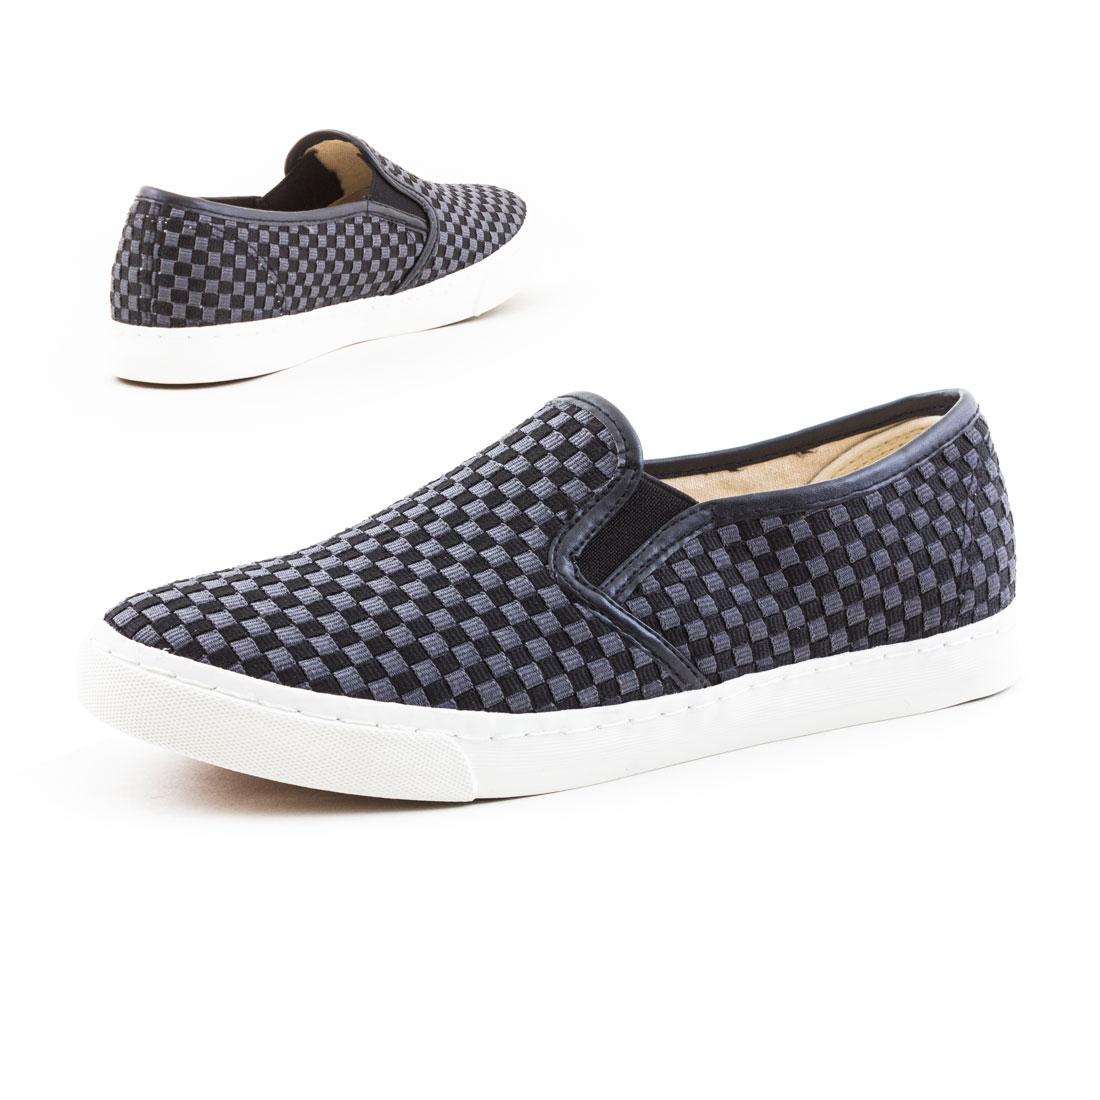 neu damen sneaker slipper canvas sport sommer schuhe gr 36. Black Bedroom Furniture Sets. Home Design Ideas